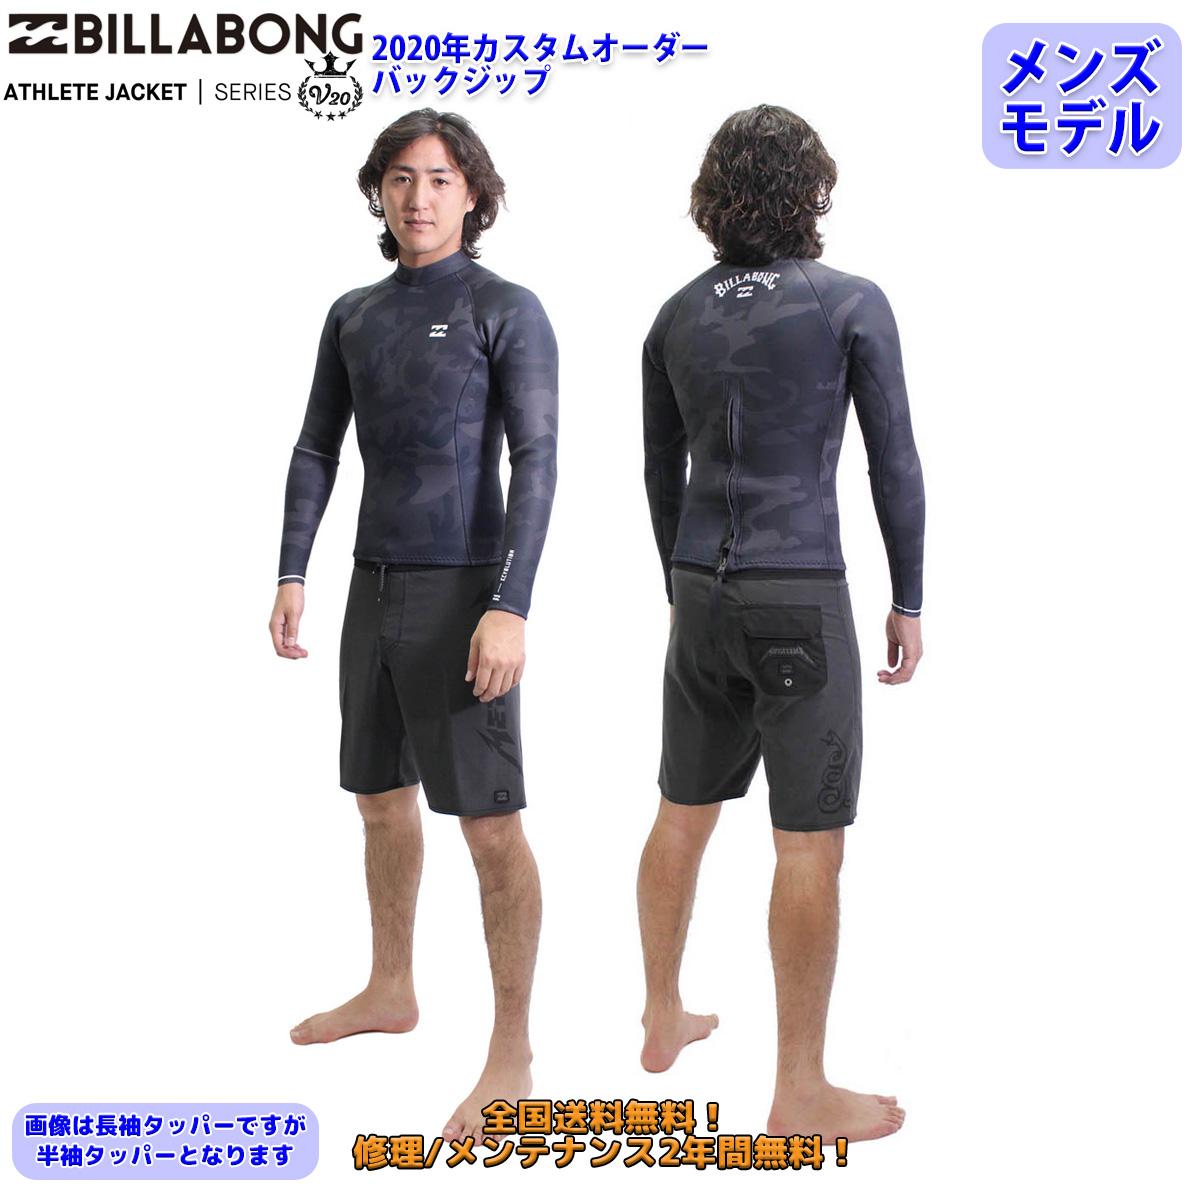 20 BILLABONG ビラボン 半袖タッパー バックジップ ウェットスーツ ウエットスーツ カスタム オーダー 春夏用 メンズモデル 2020年 品番 BA018-520 日本正規品